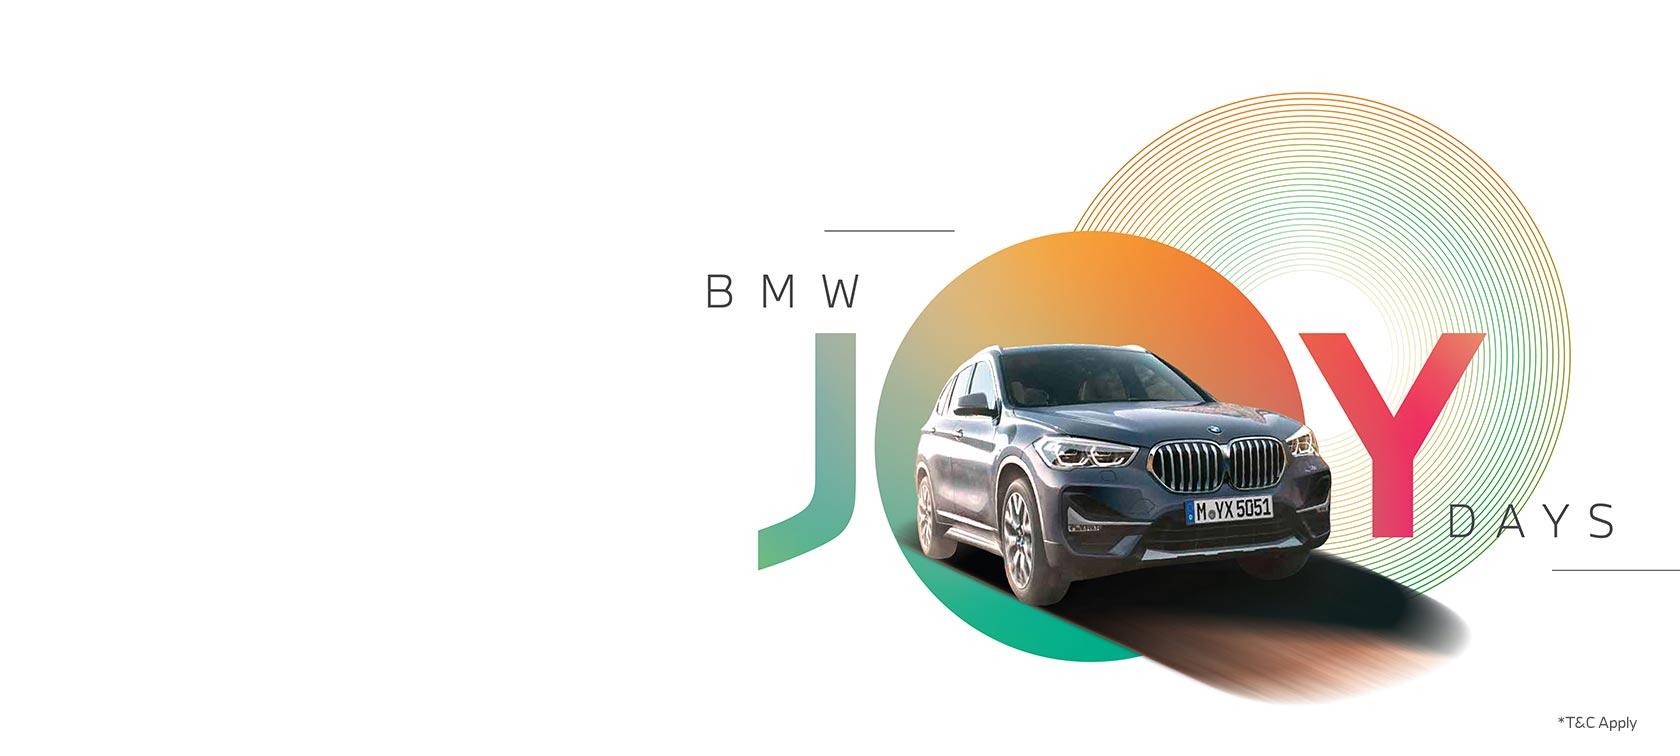 The BMW X1 Series